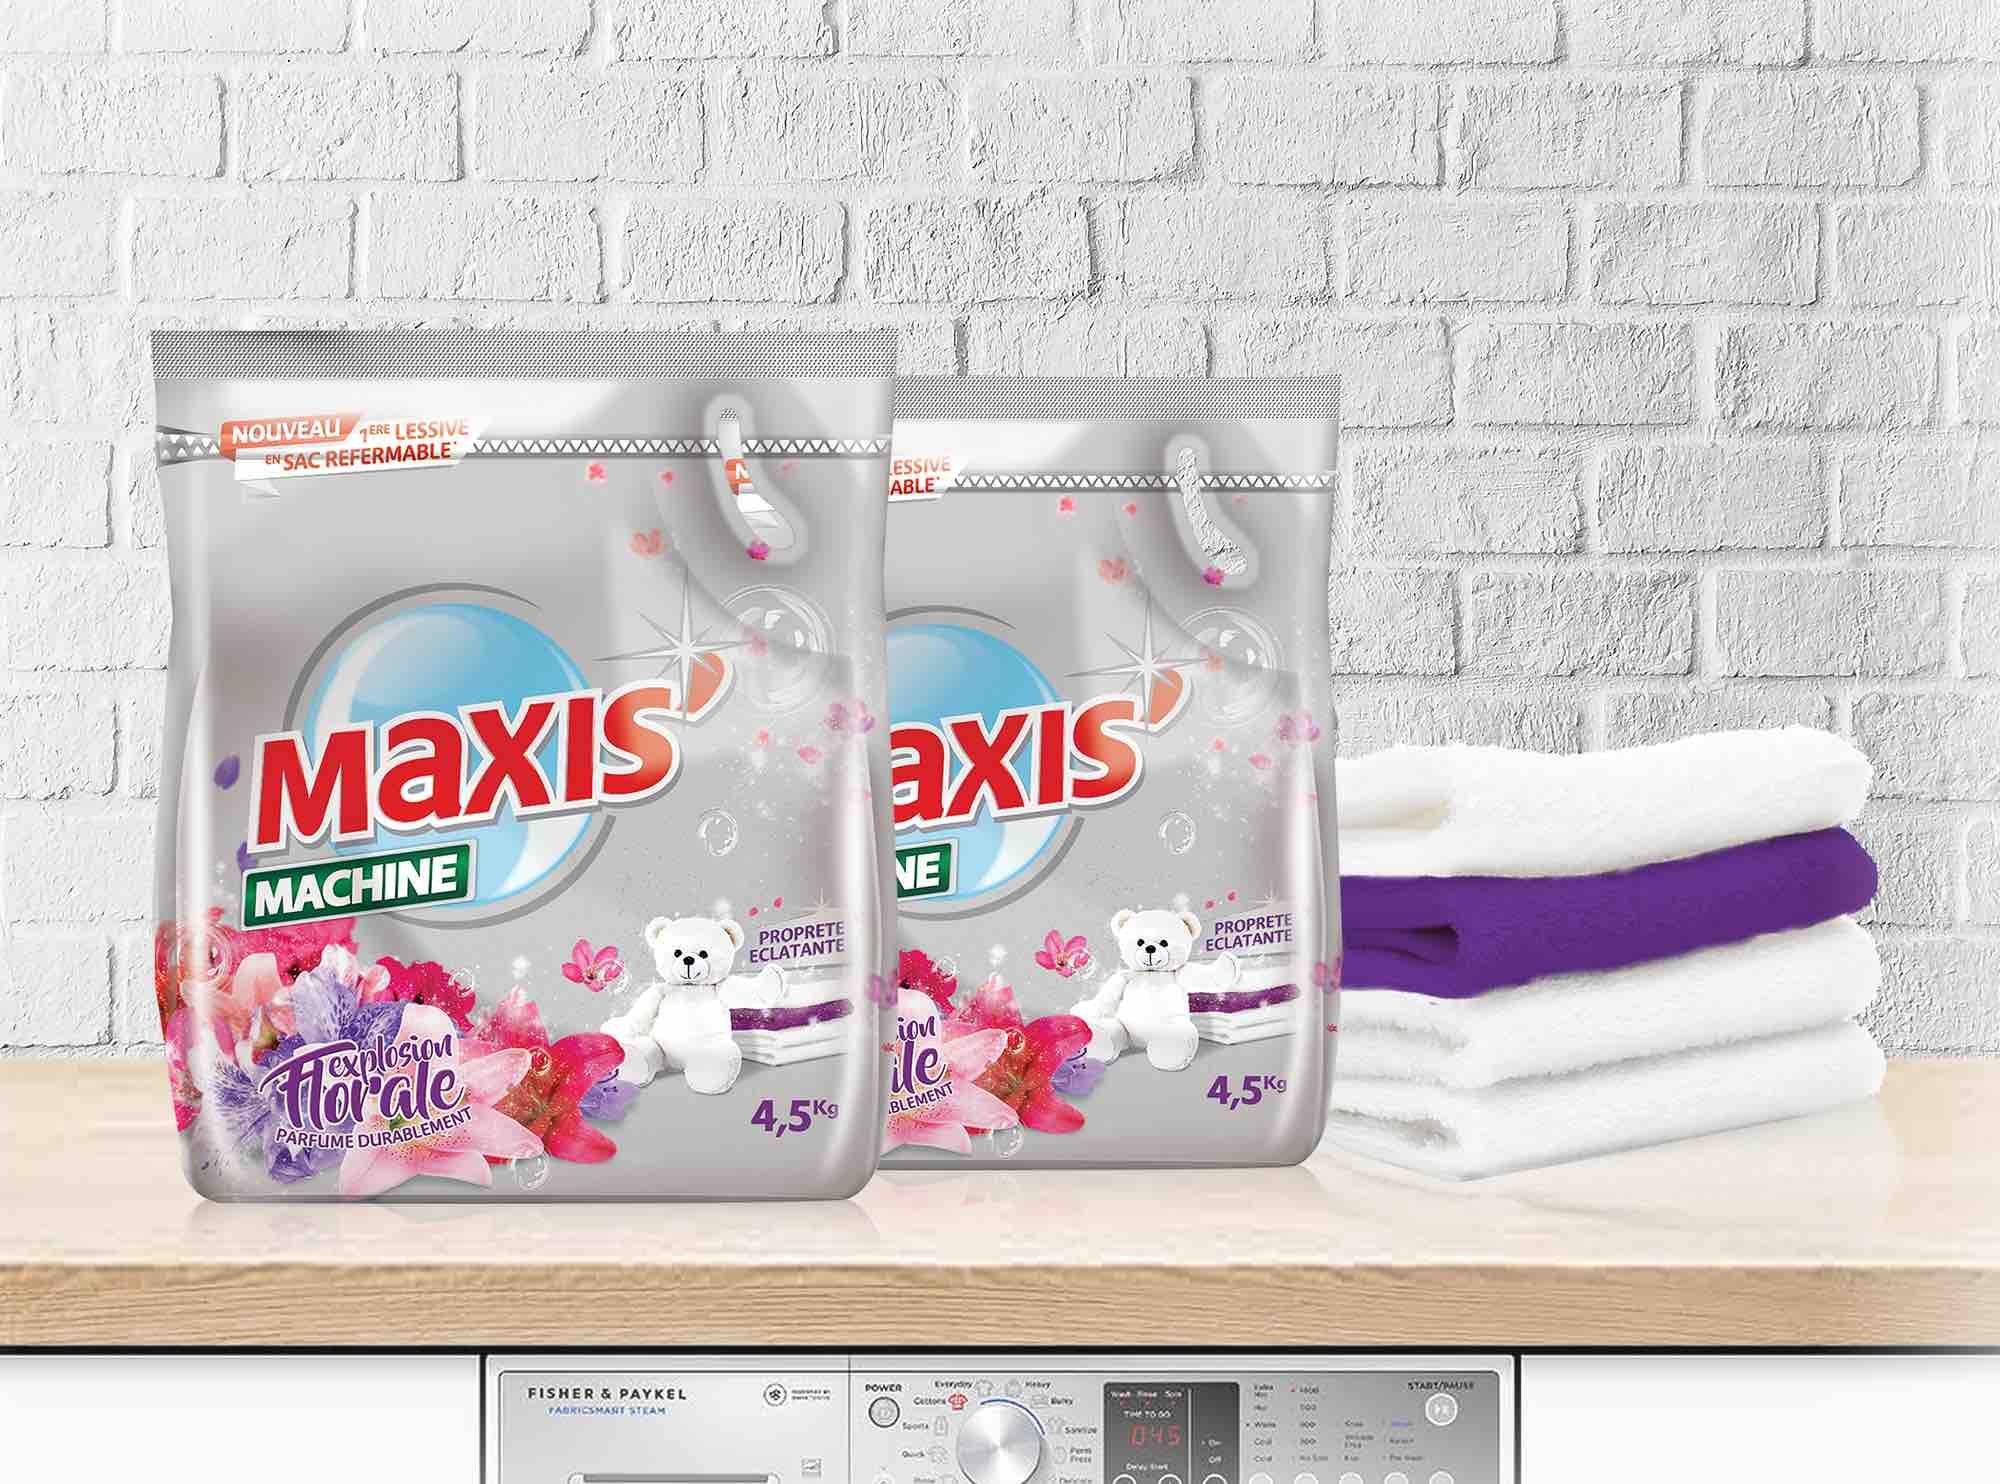 packtory-maxis-machine-mutandis-distra-packaging-01